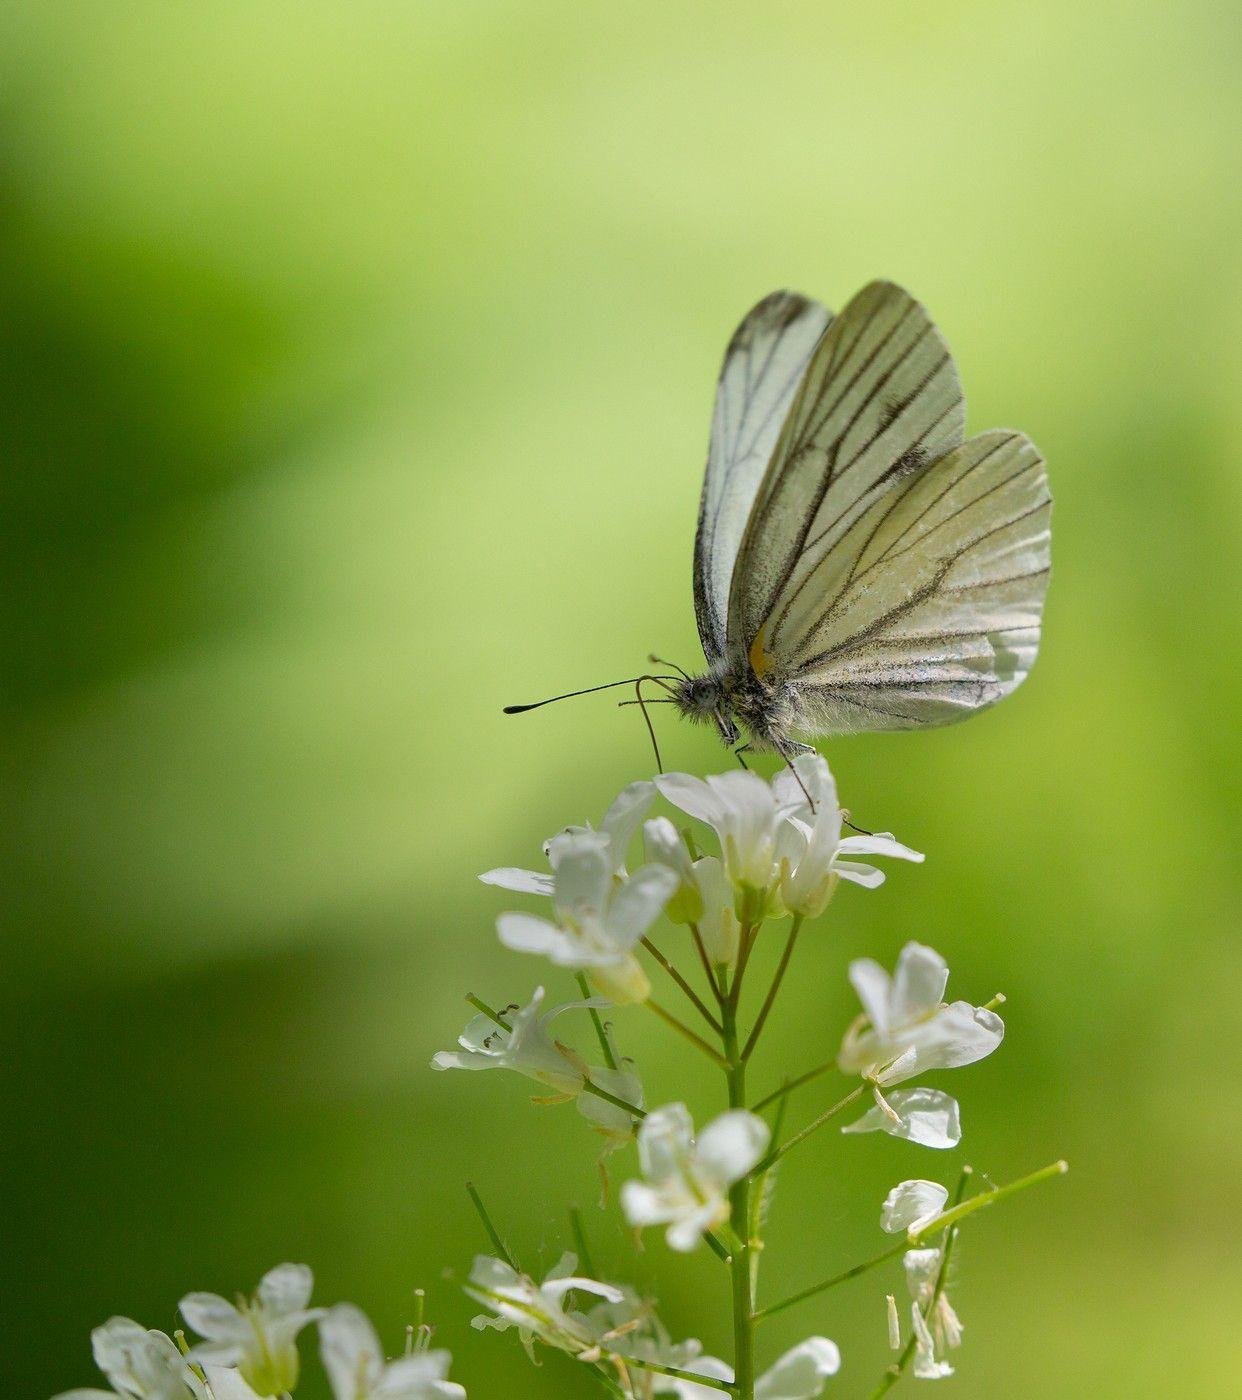 бабочка белянка май, Слободской Евгений